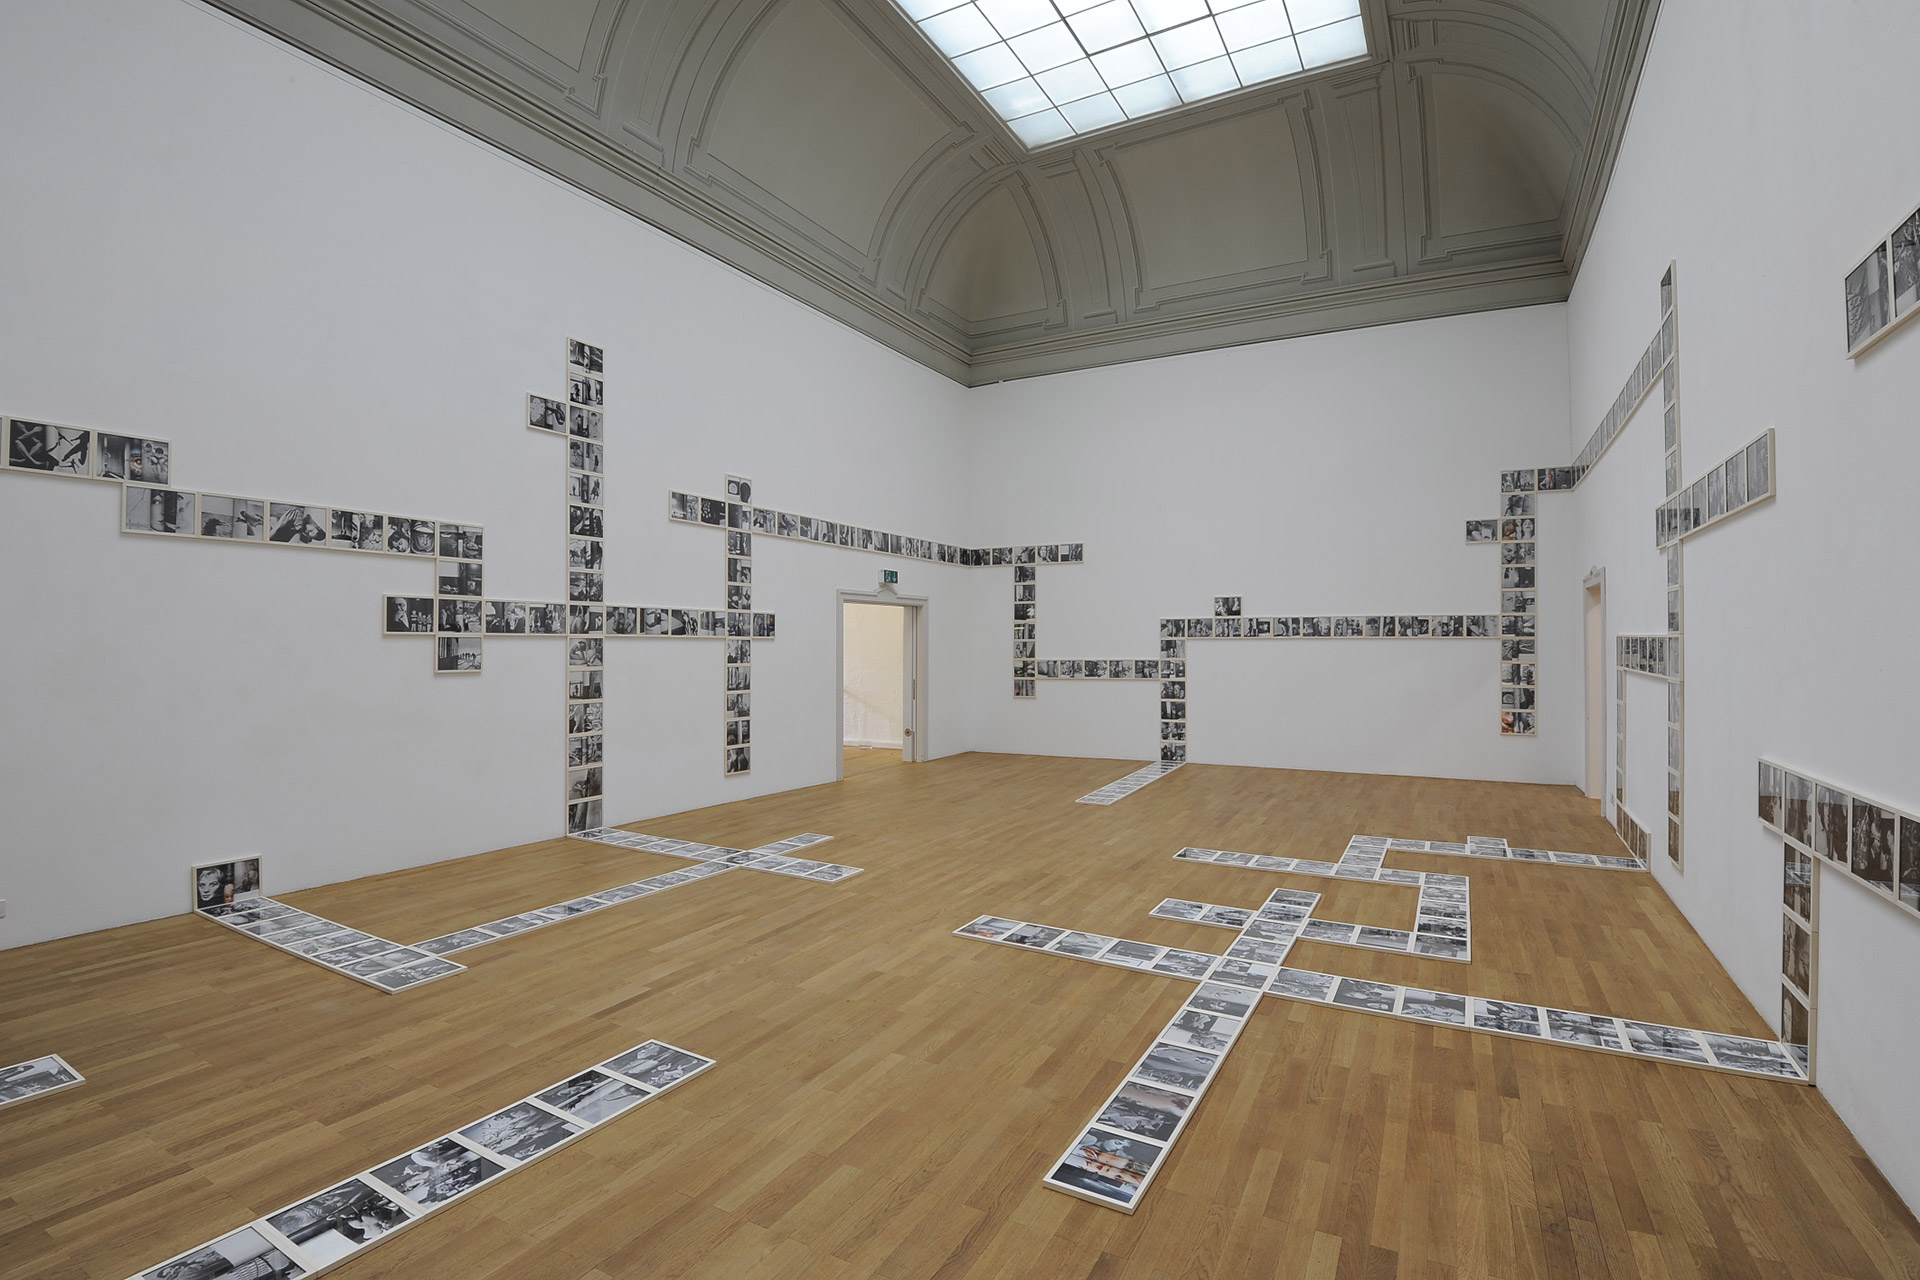 Martin-Soto-Climent-Kunsthalle-Winterthur-2012-1.jpg